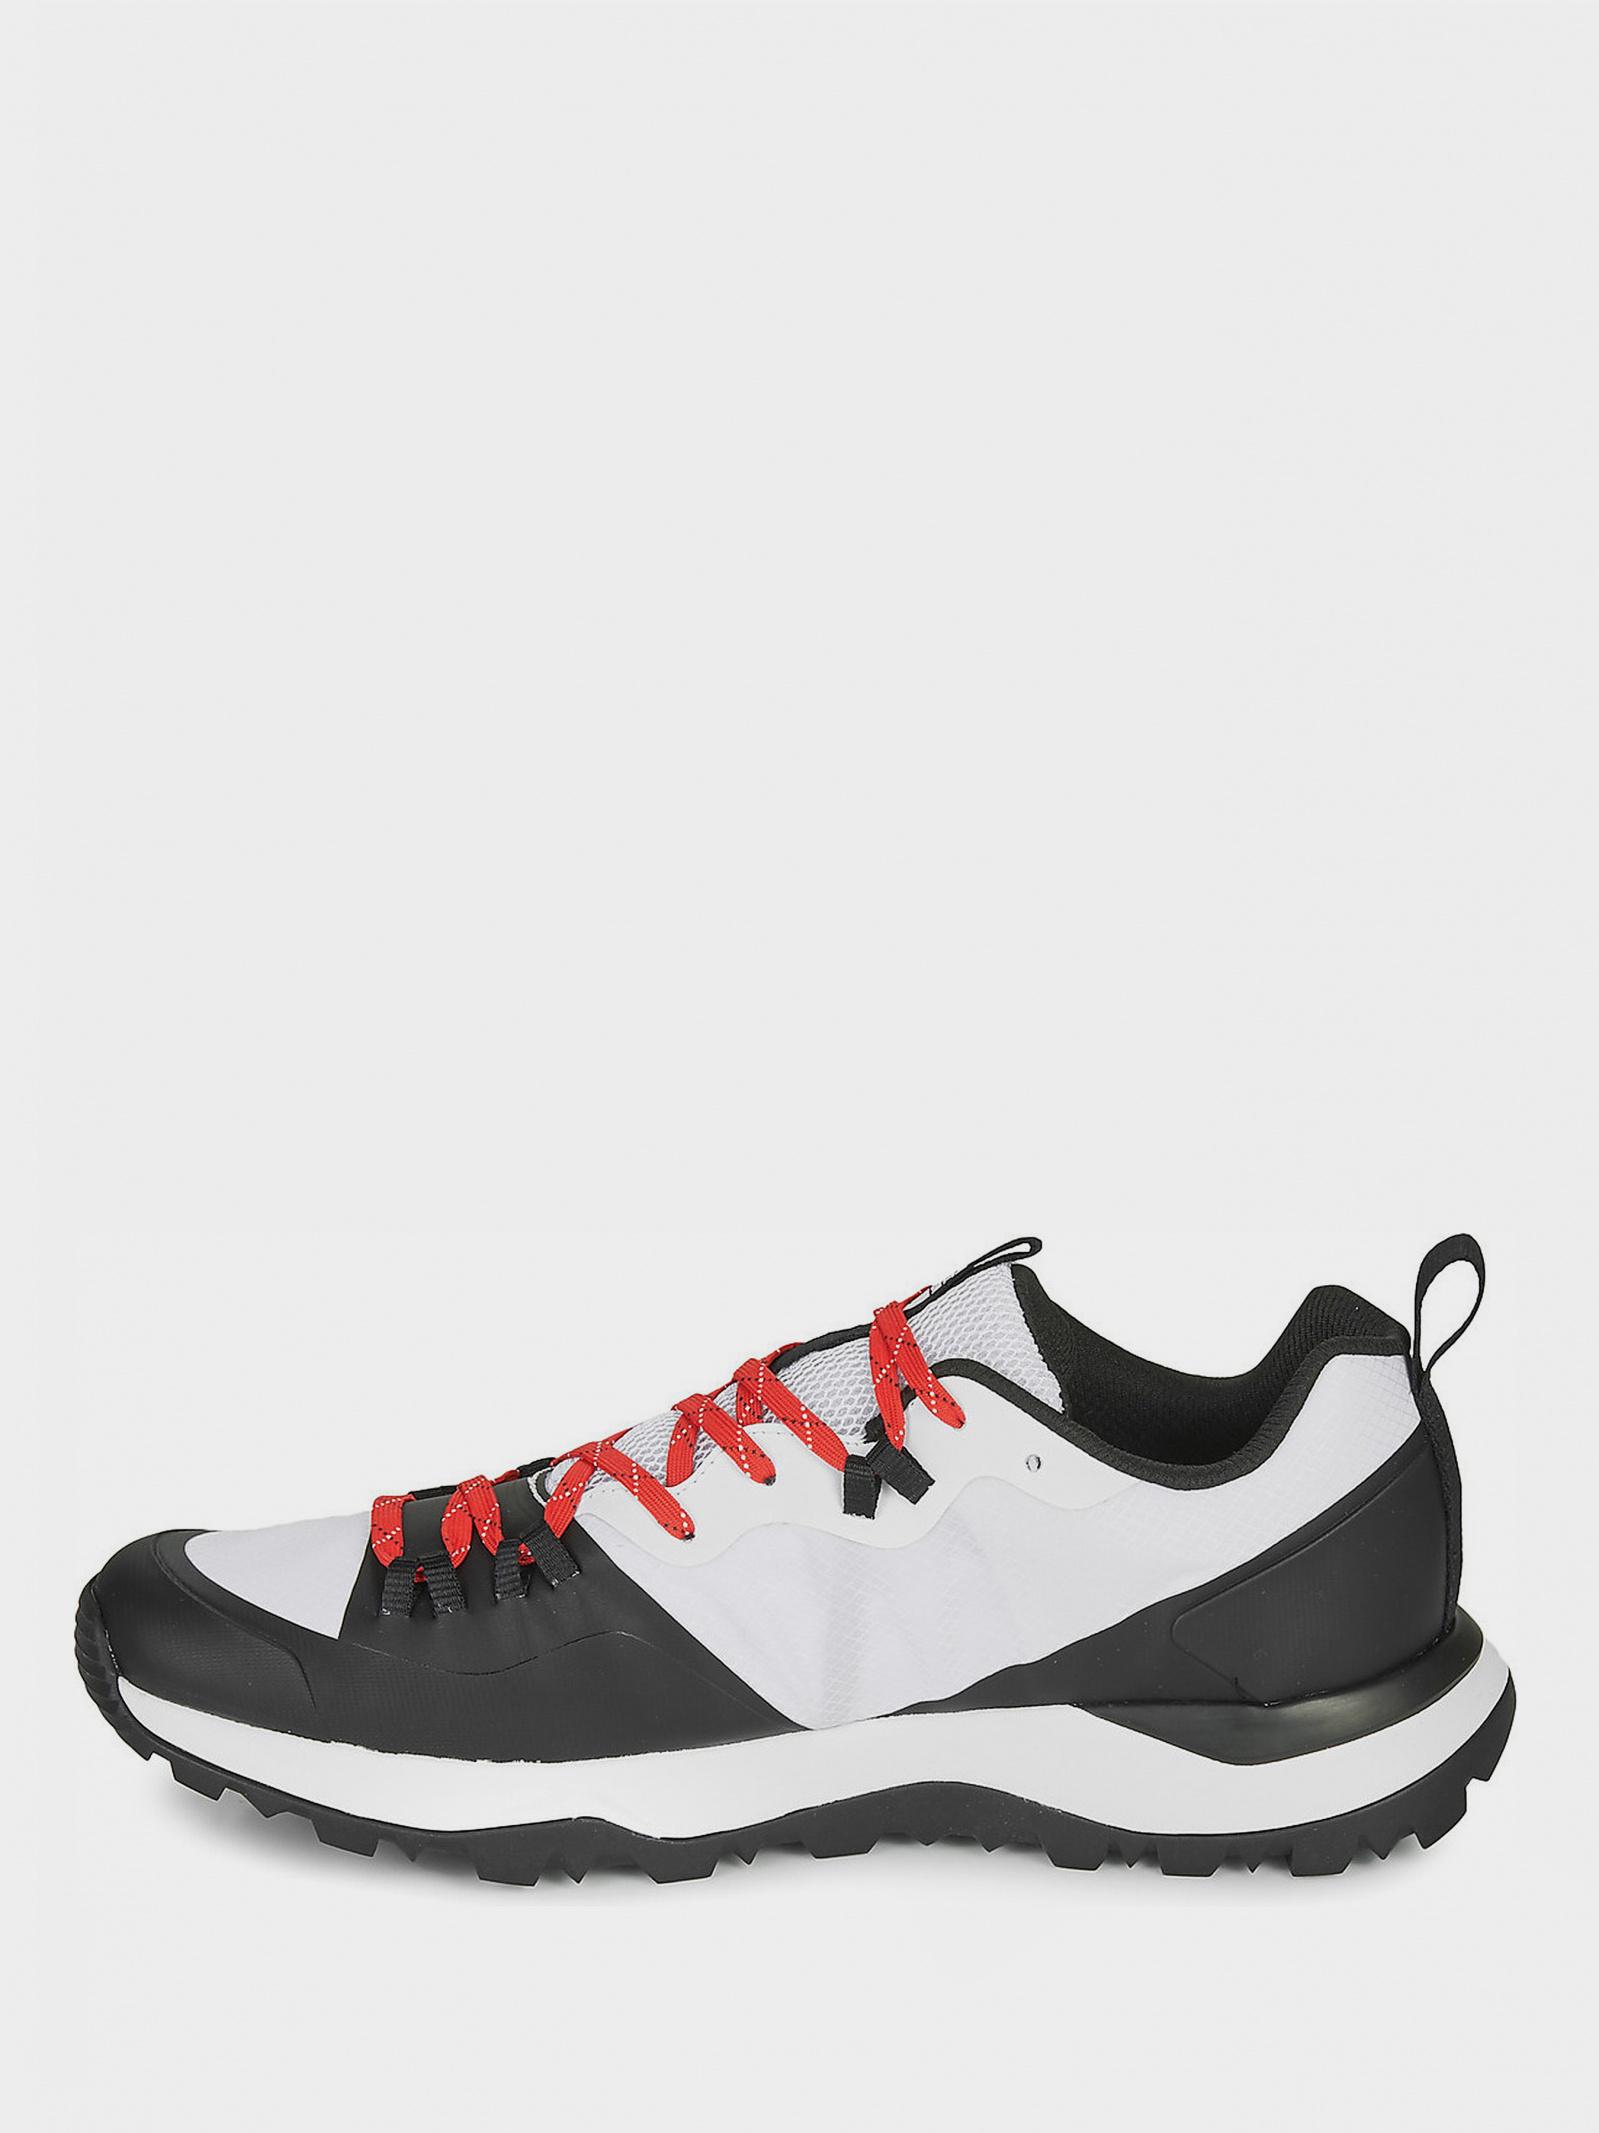 Кросівки  чоловічі The North Face NF0A47B1LA91 NF0A47B1LA91 ціна, 2017